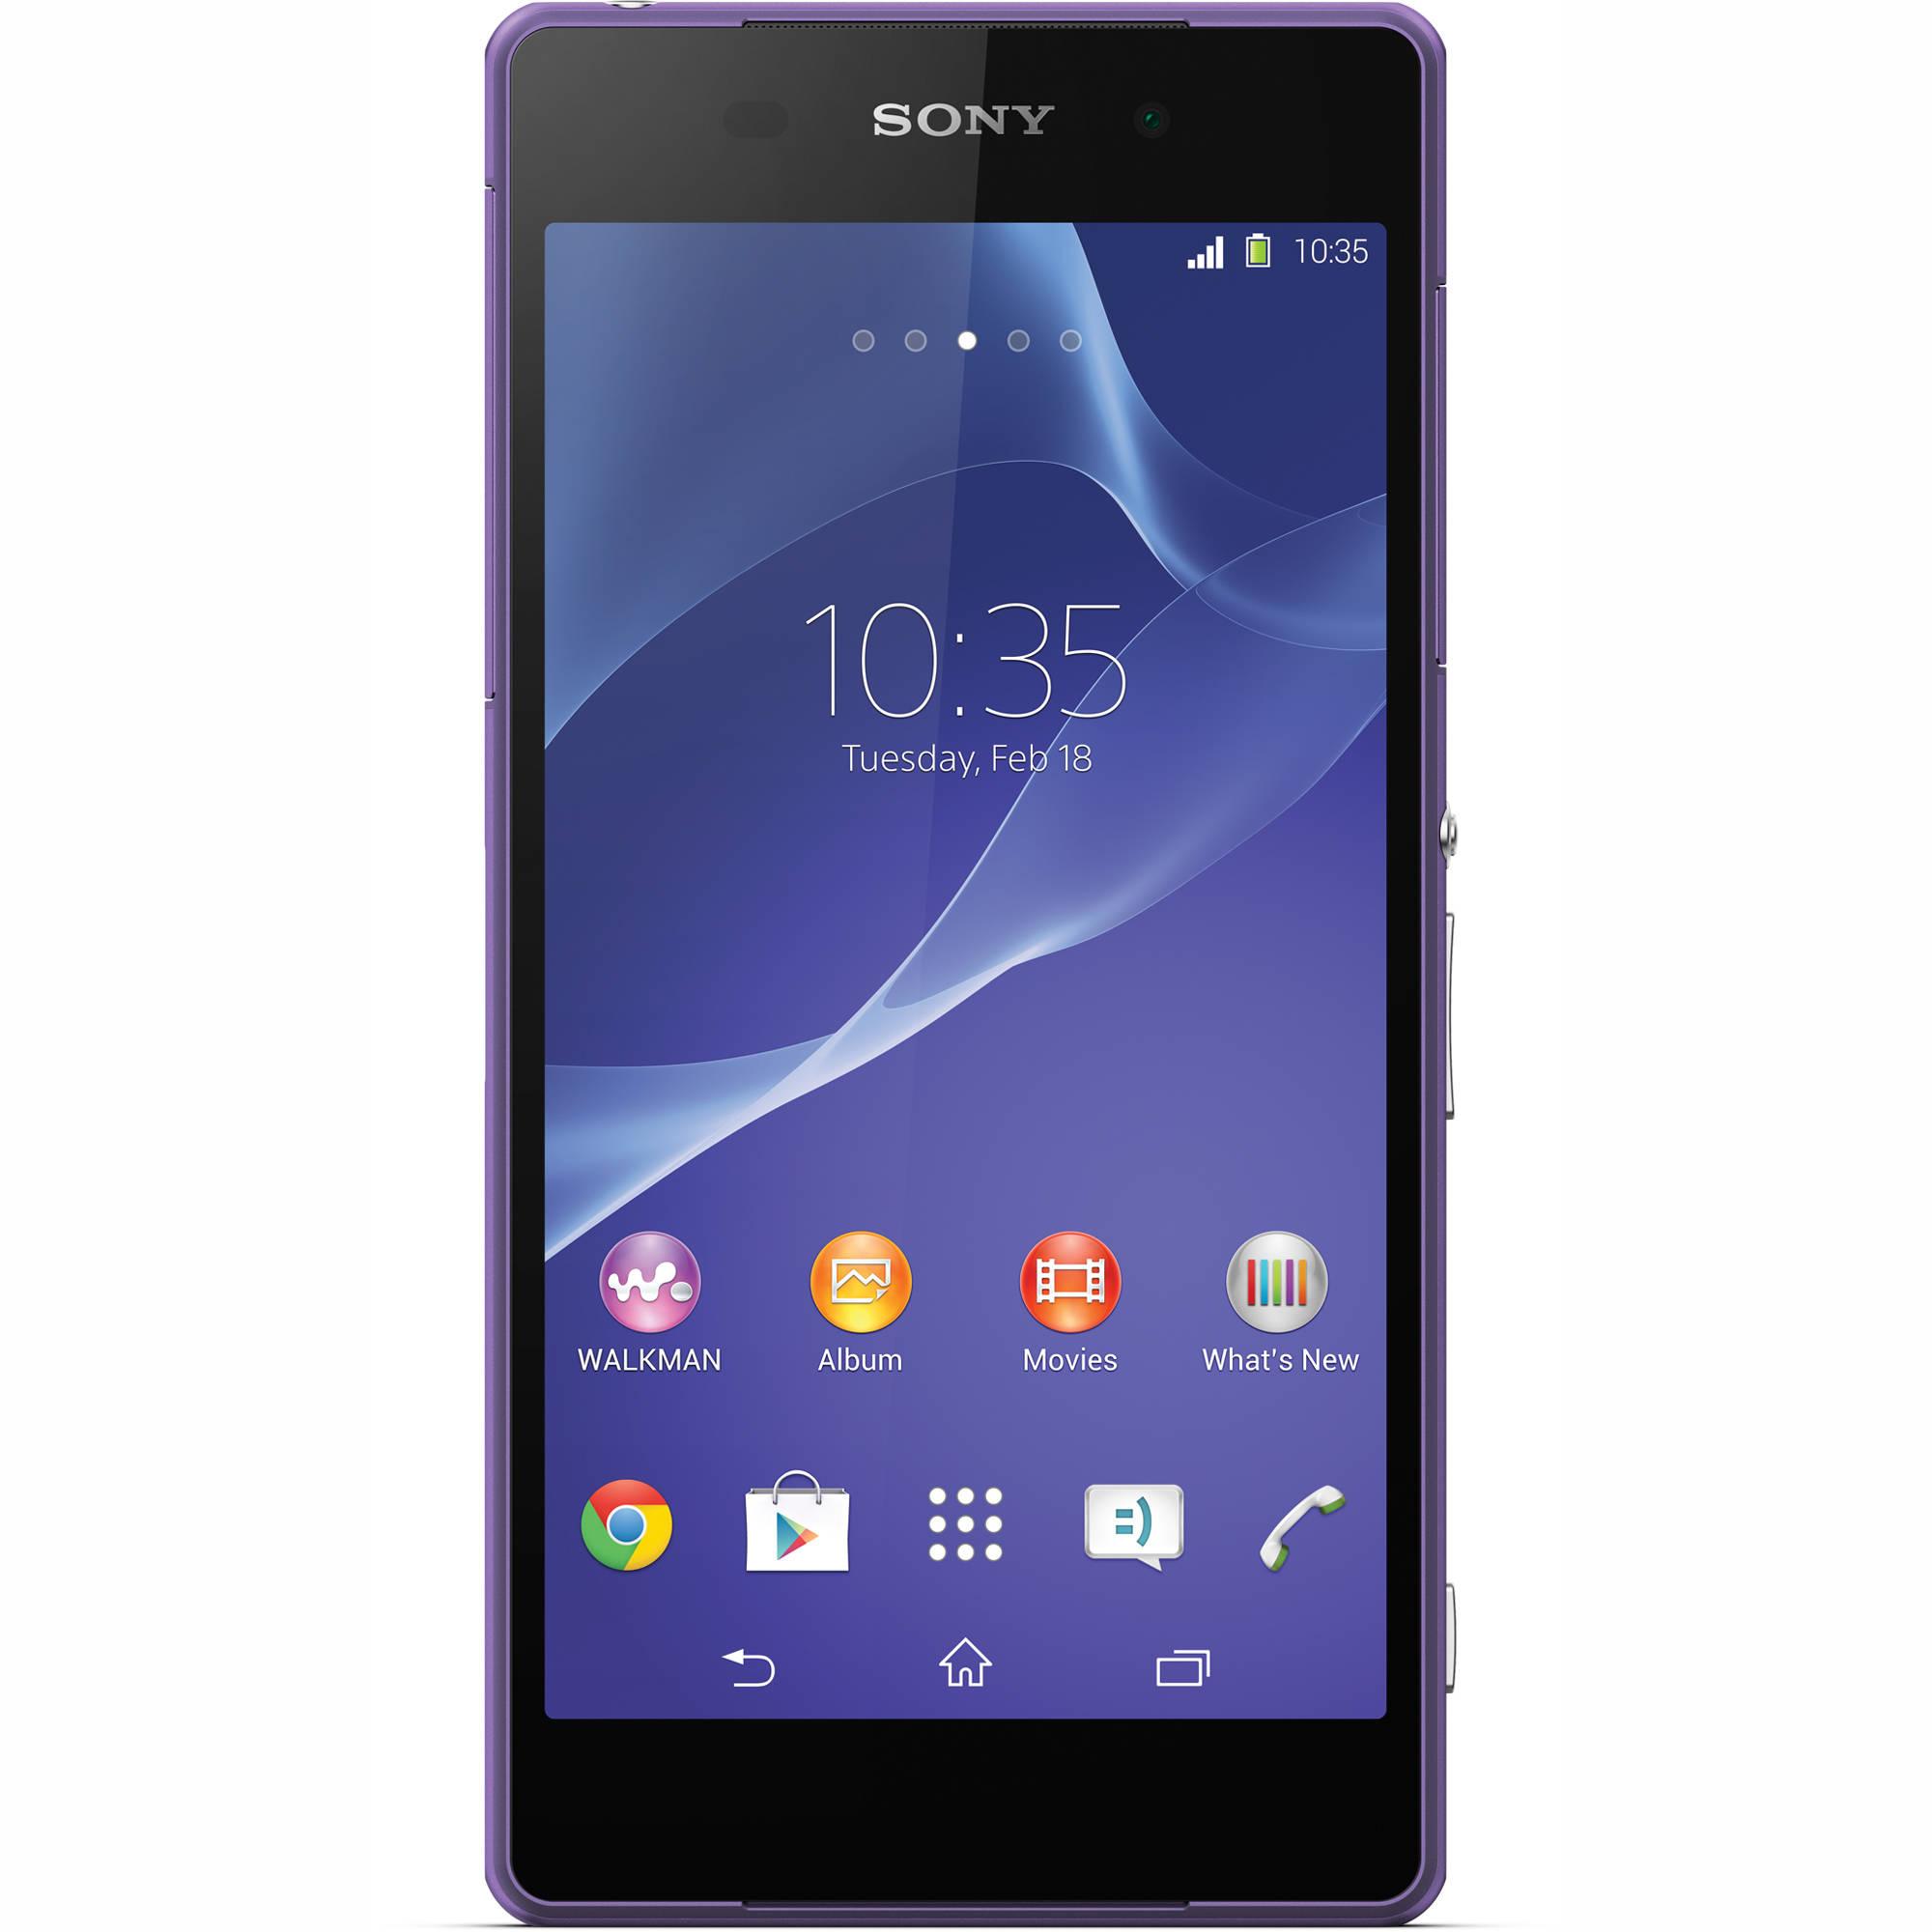 Sony xperia z2 d6503 violet - 7c5d